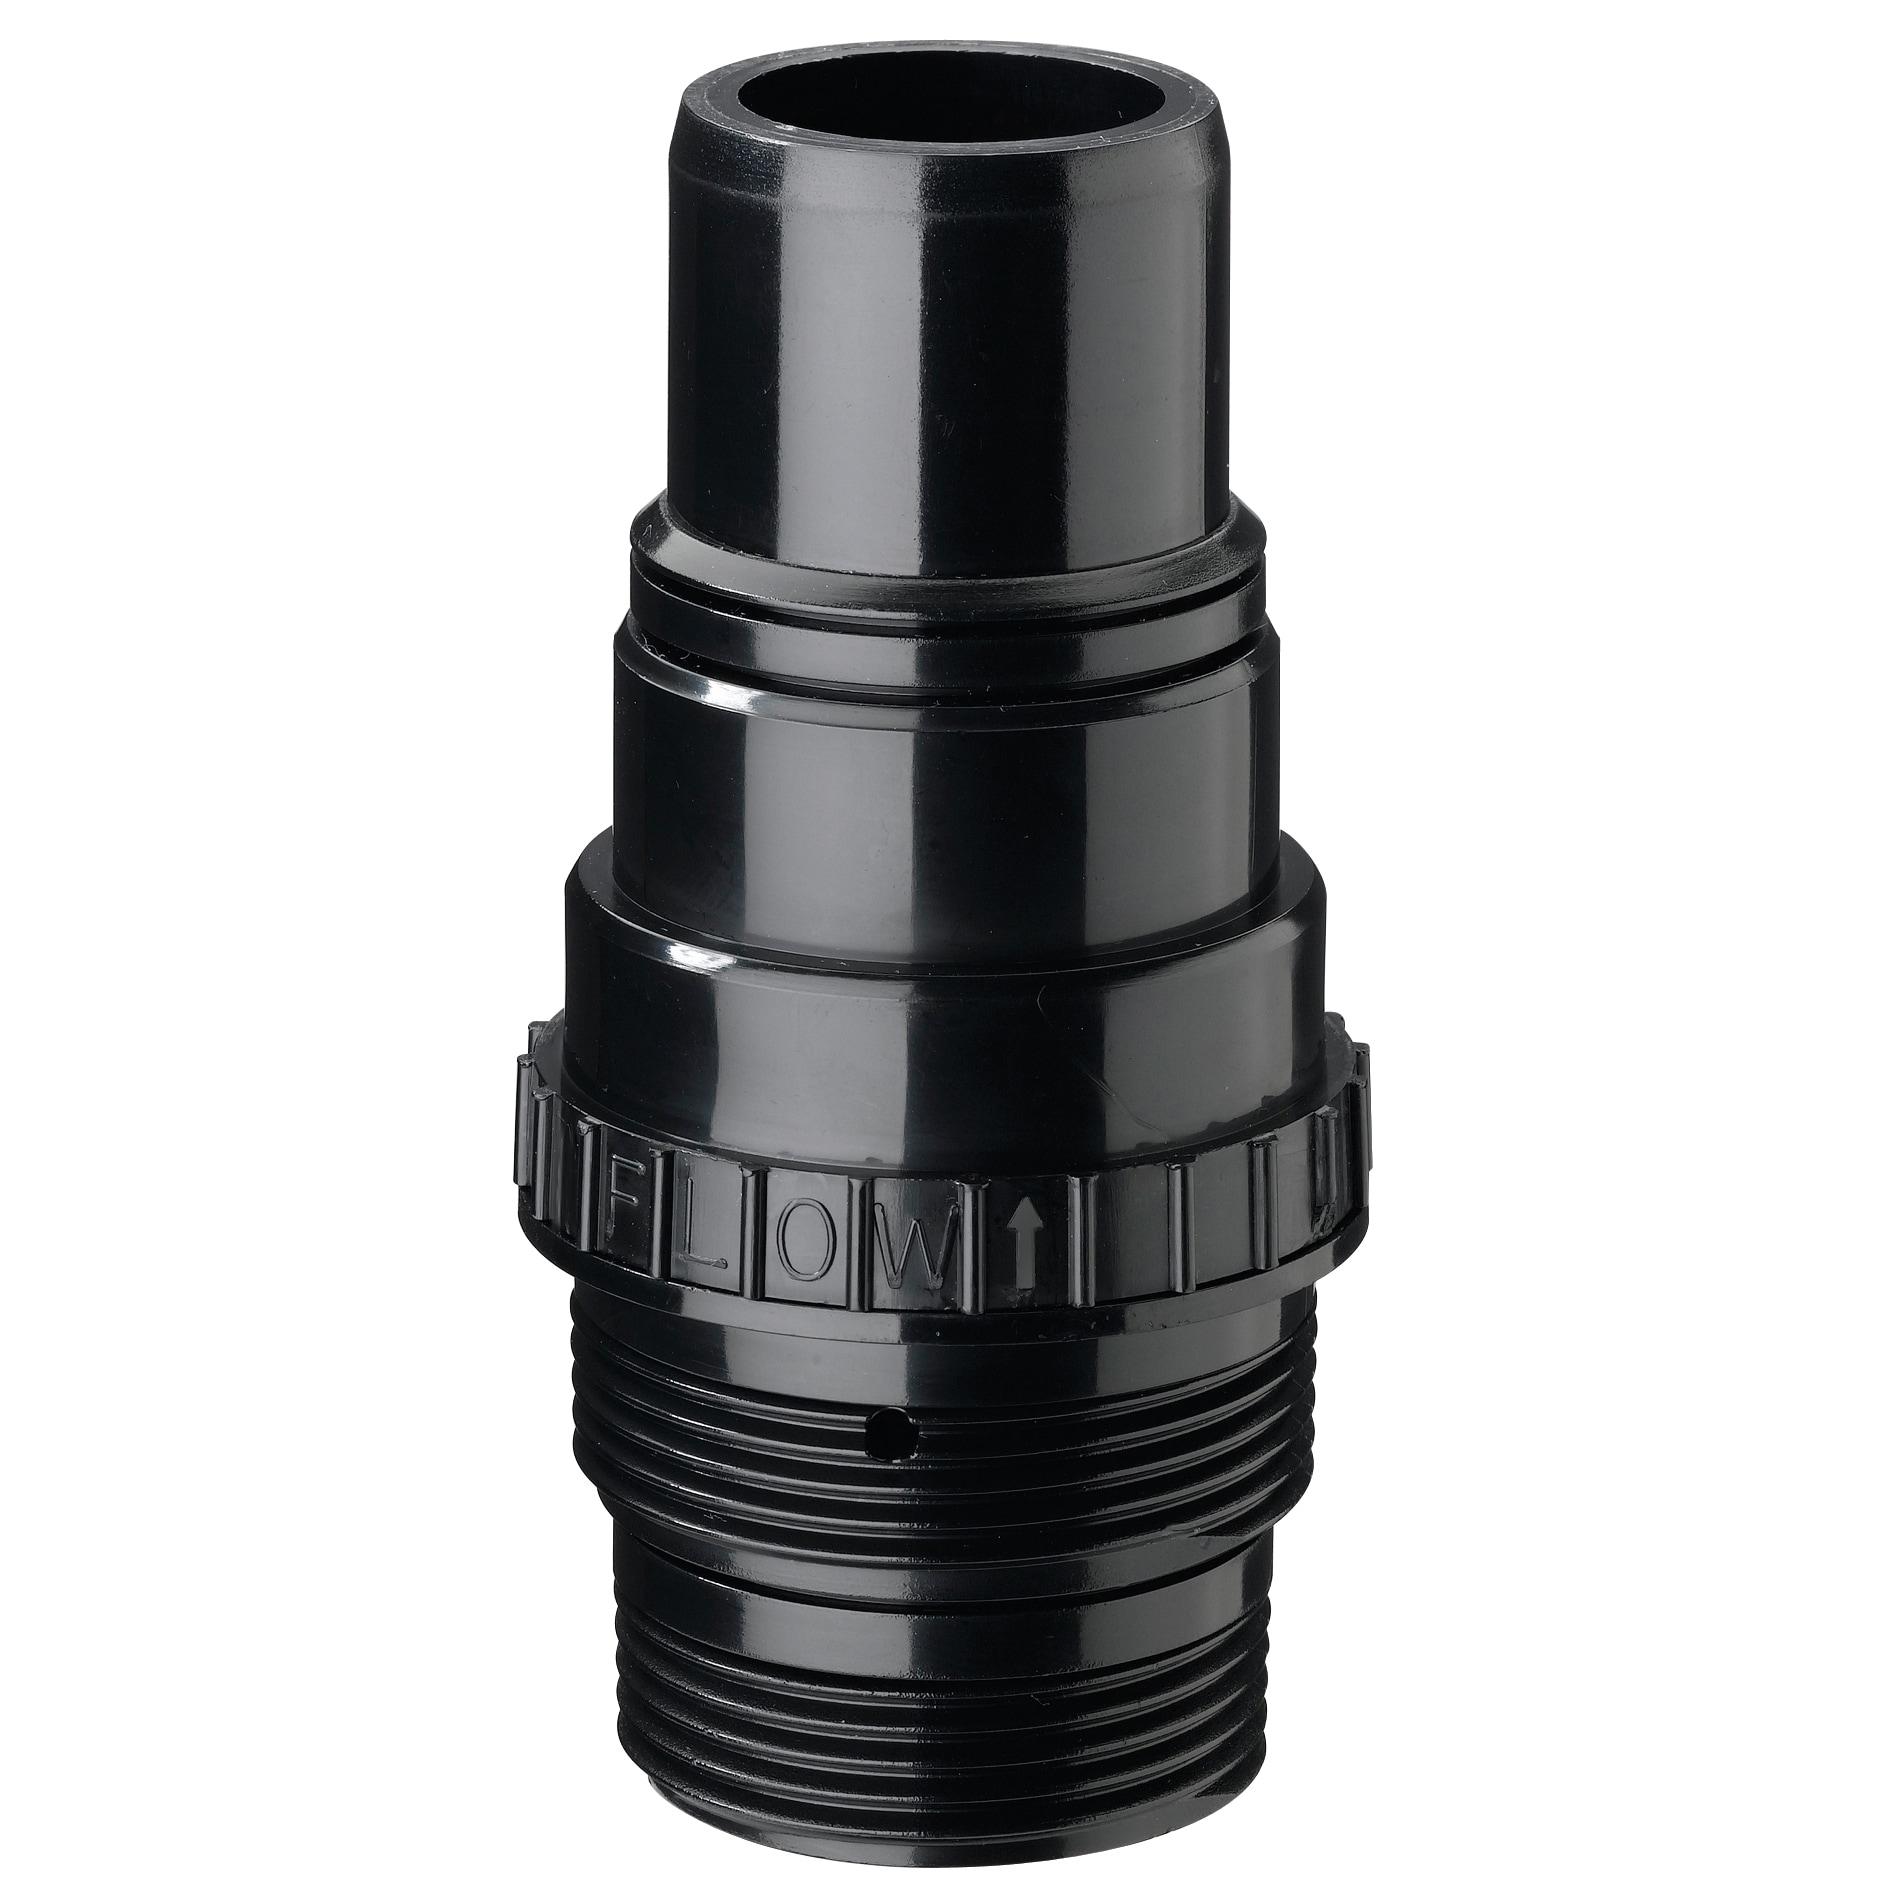 Pentair Flotec FP0026-6D-P2 Sump Pump Check Valve (Valve ...